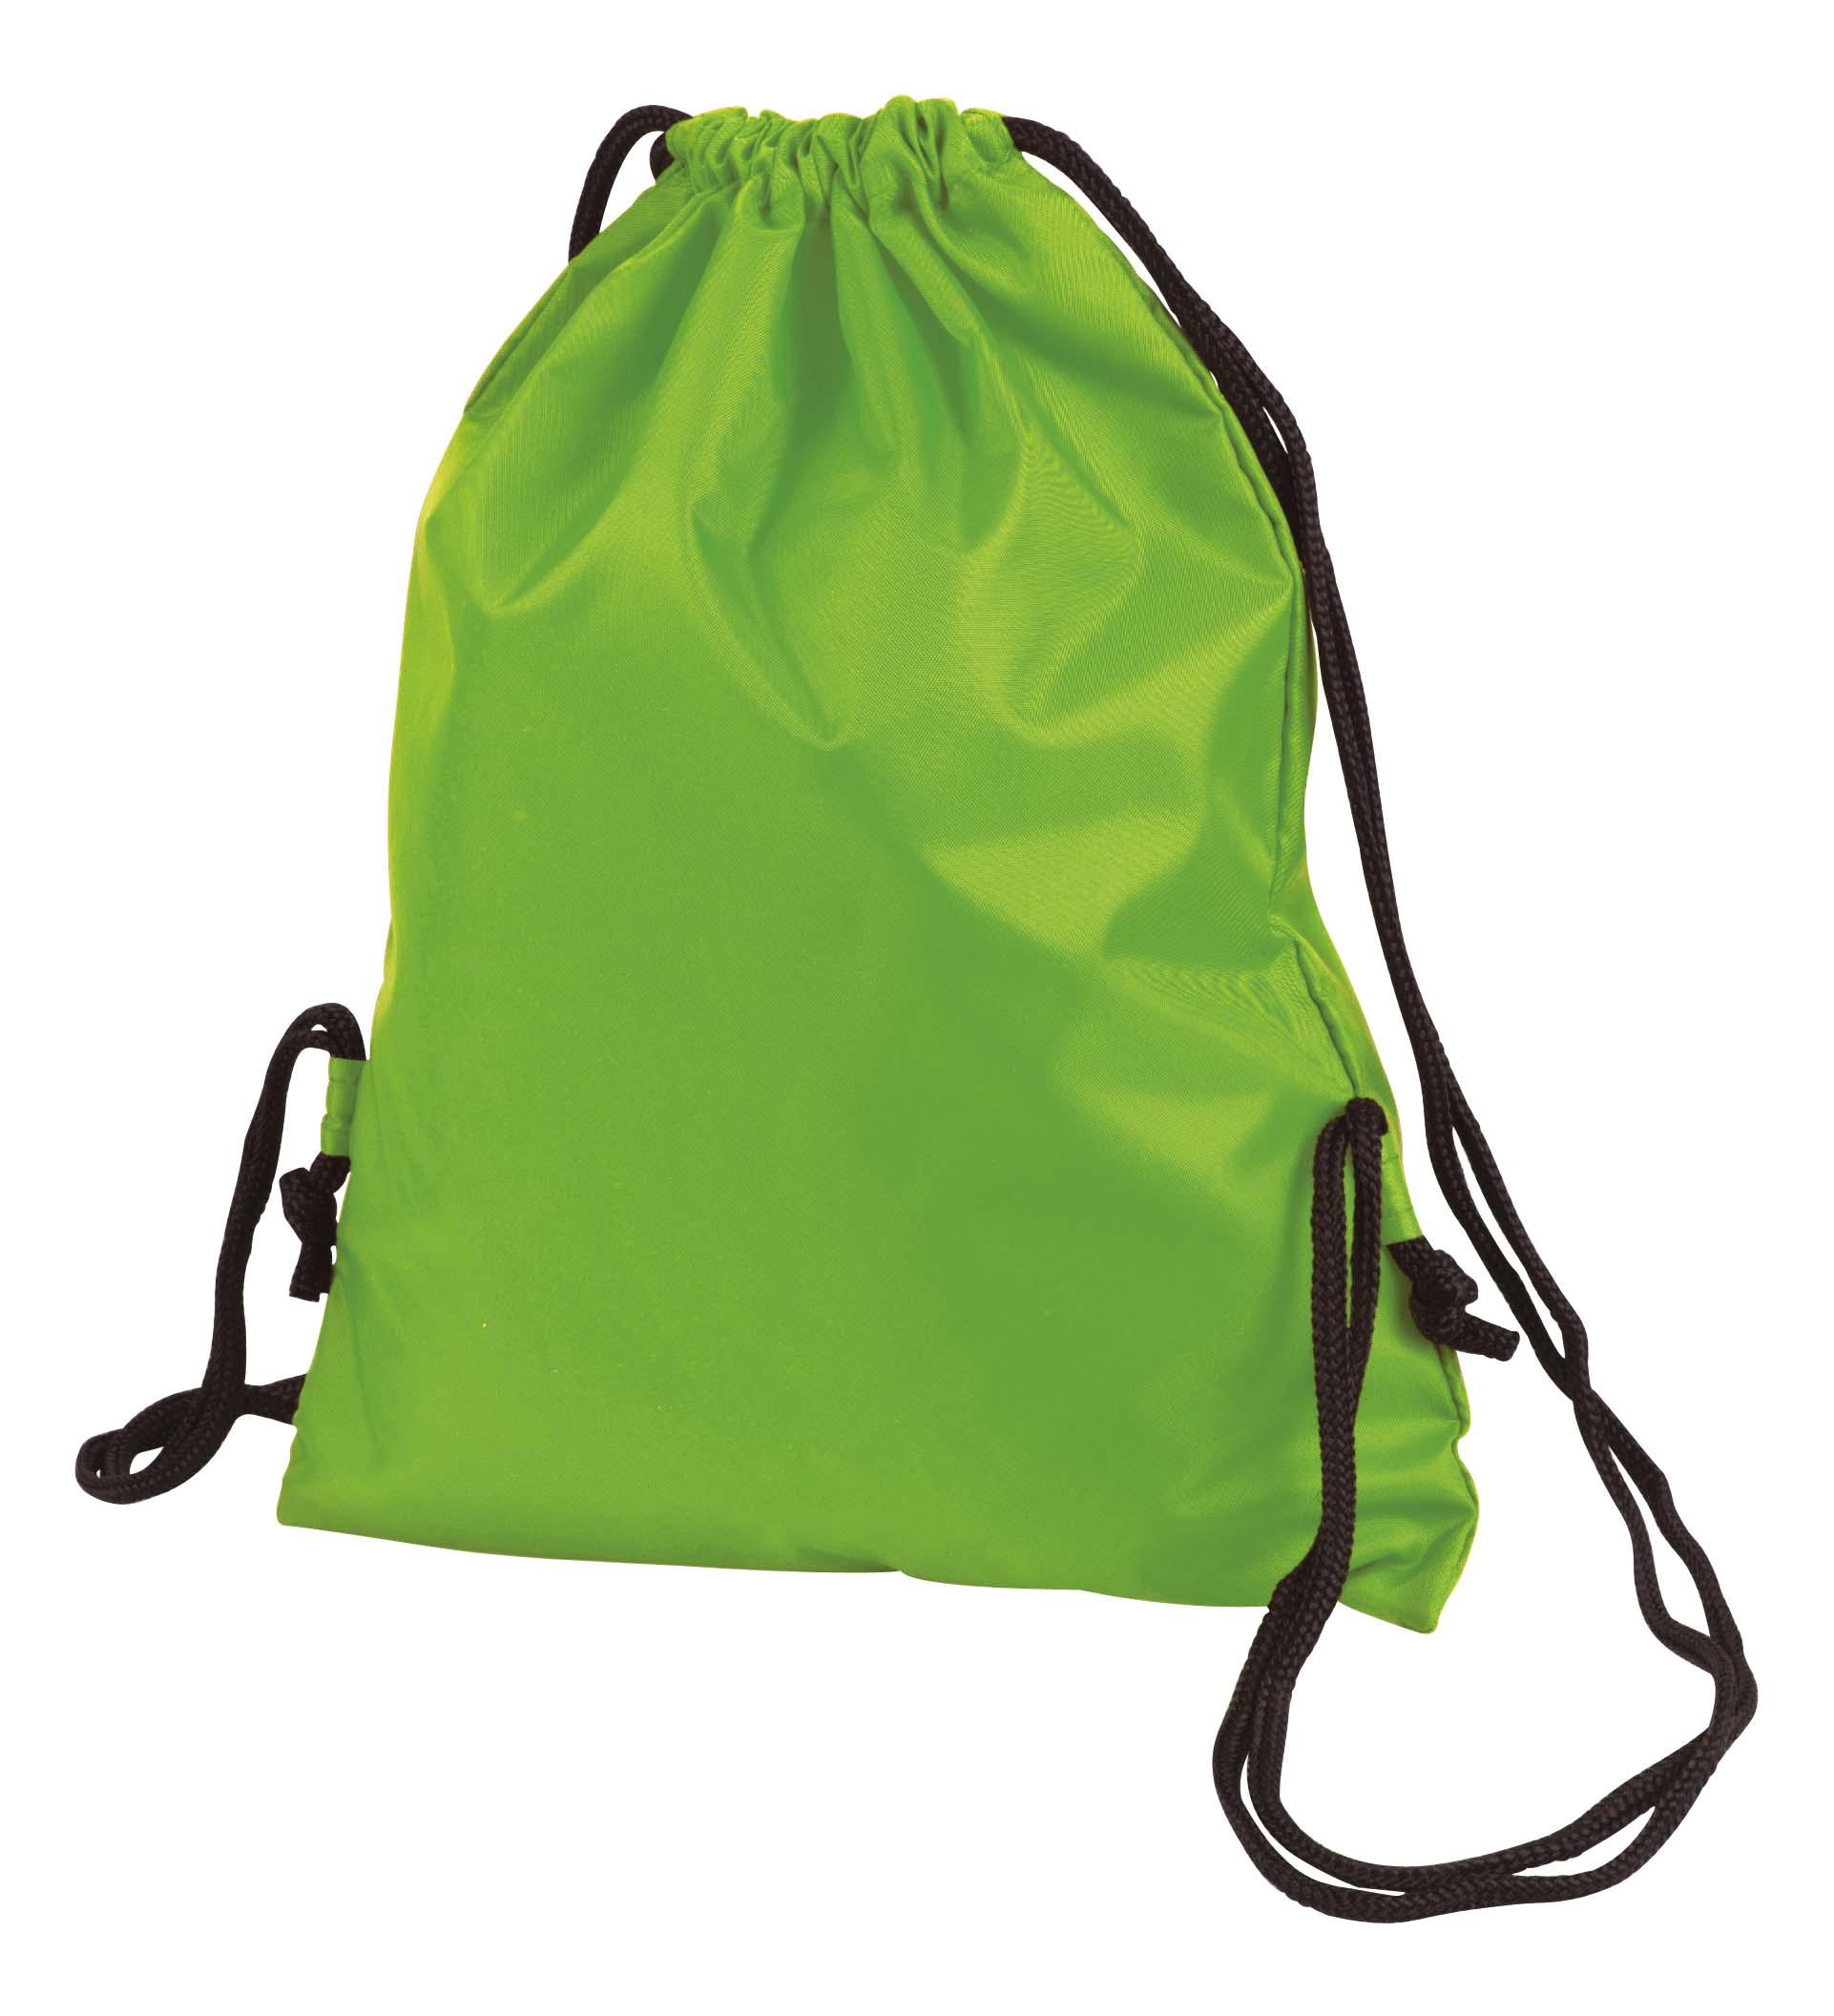 Green Taffeta Backpack Sport